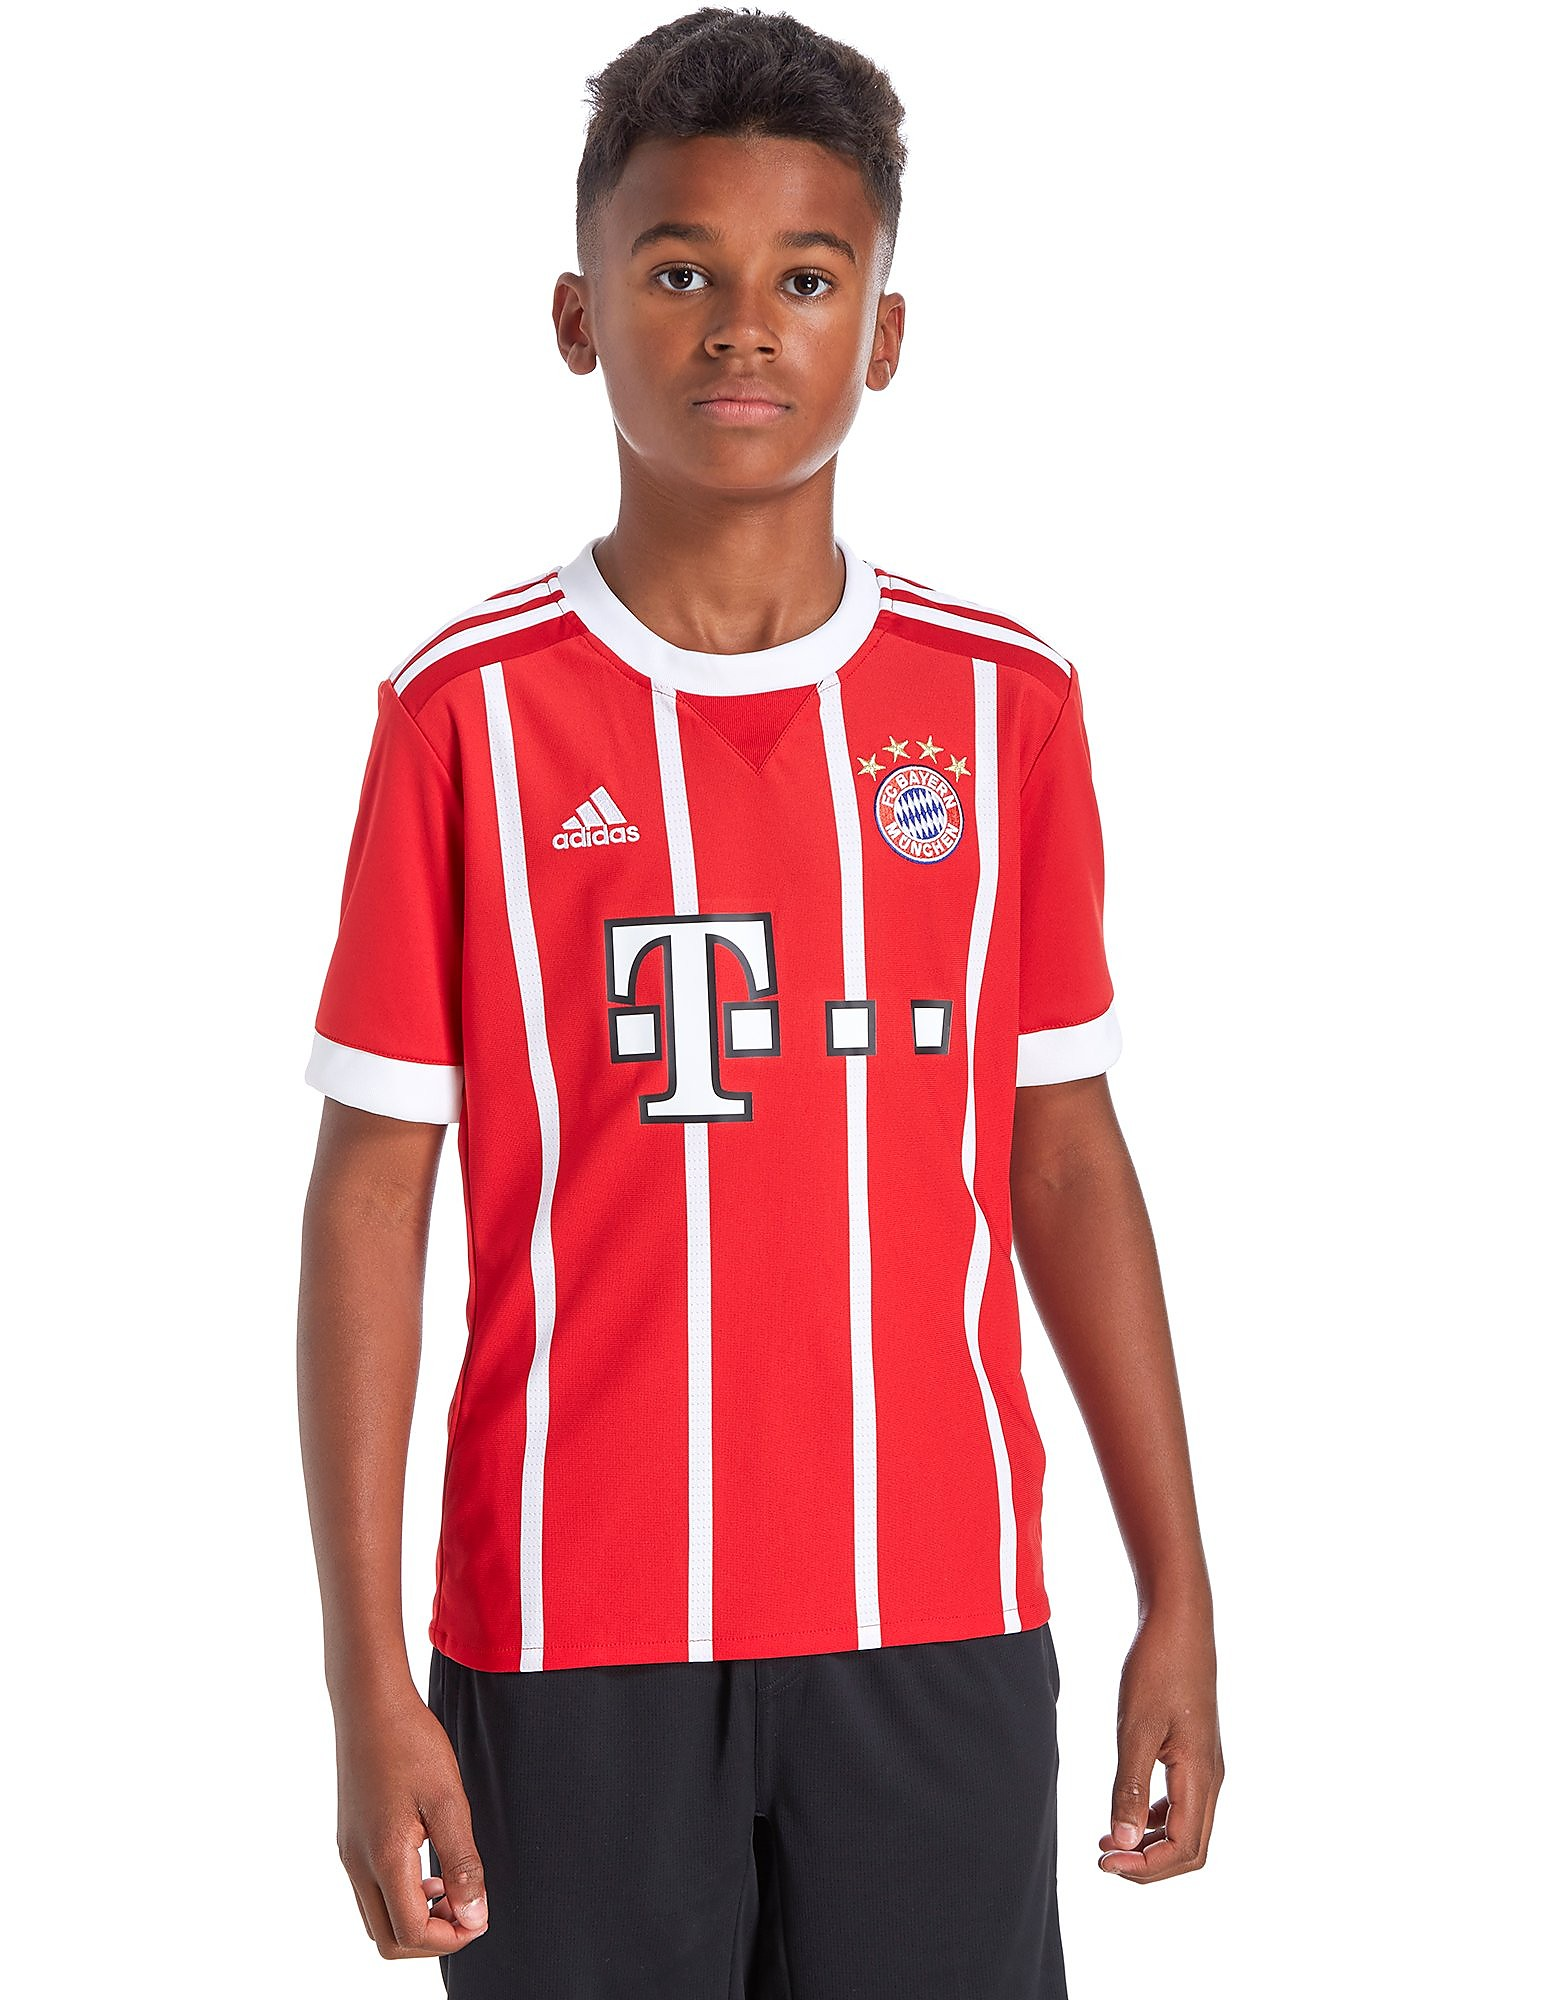 adidas FC Bayern Munich 2017/18 Home Shirt Junior